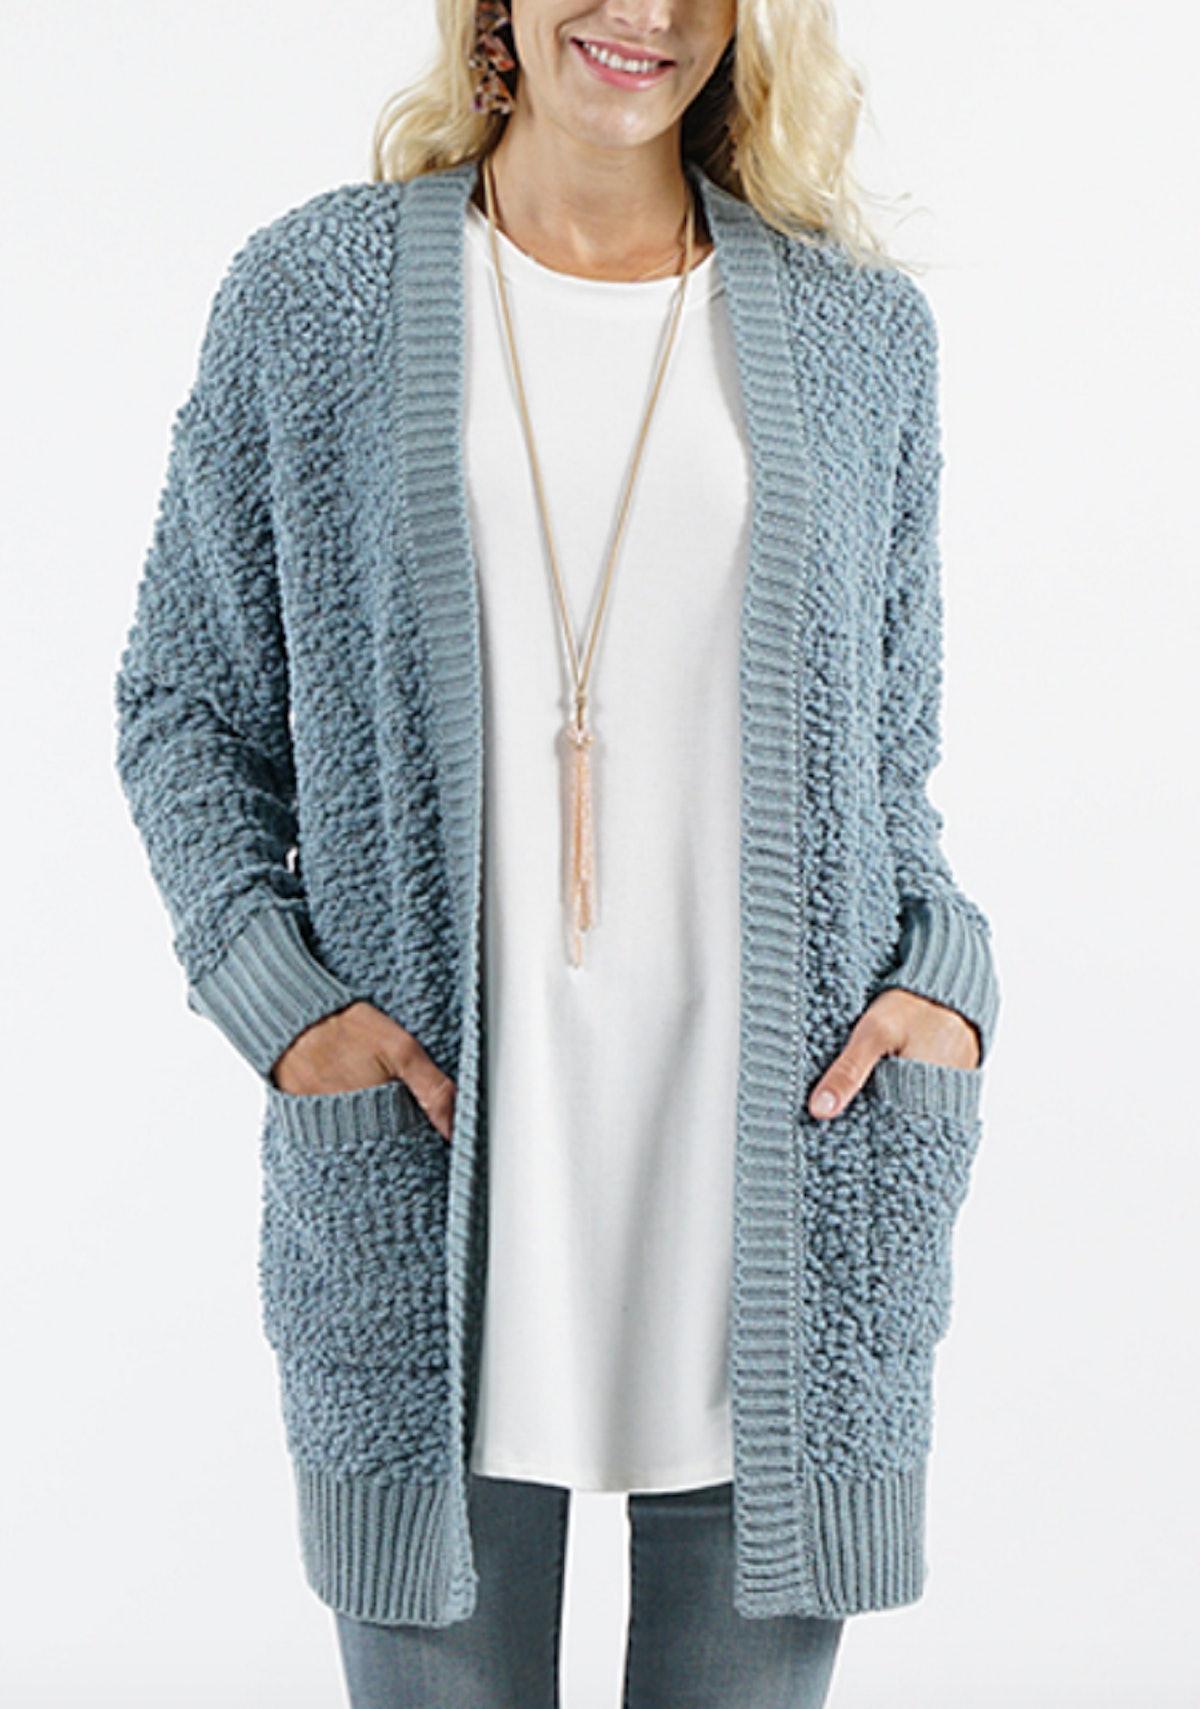 Blue Gray Knit Cardigan